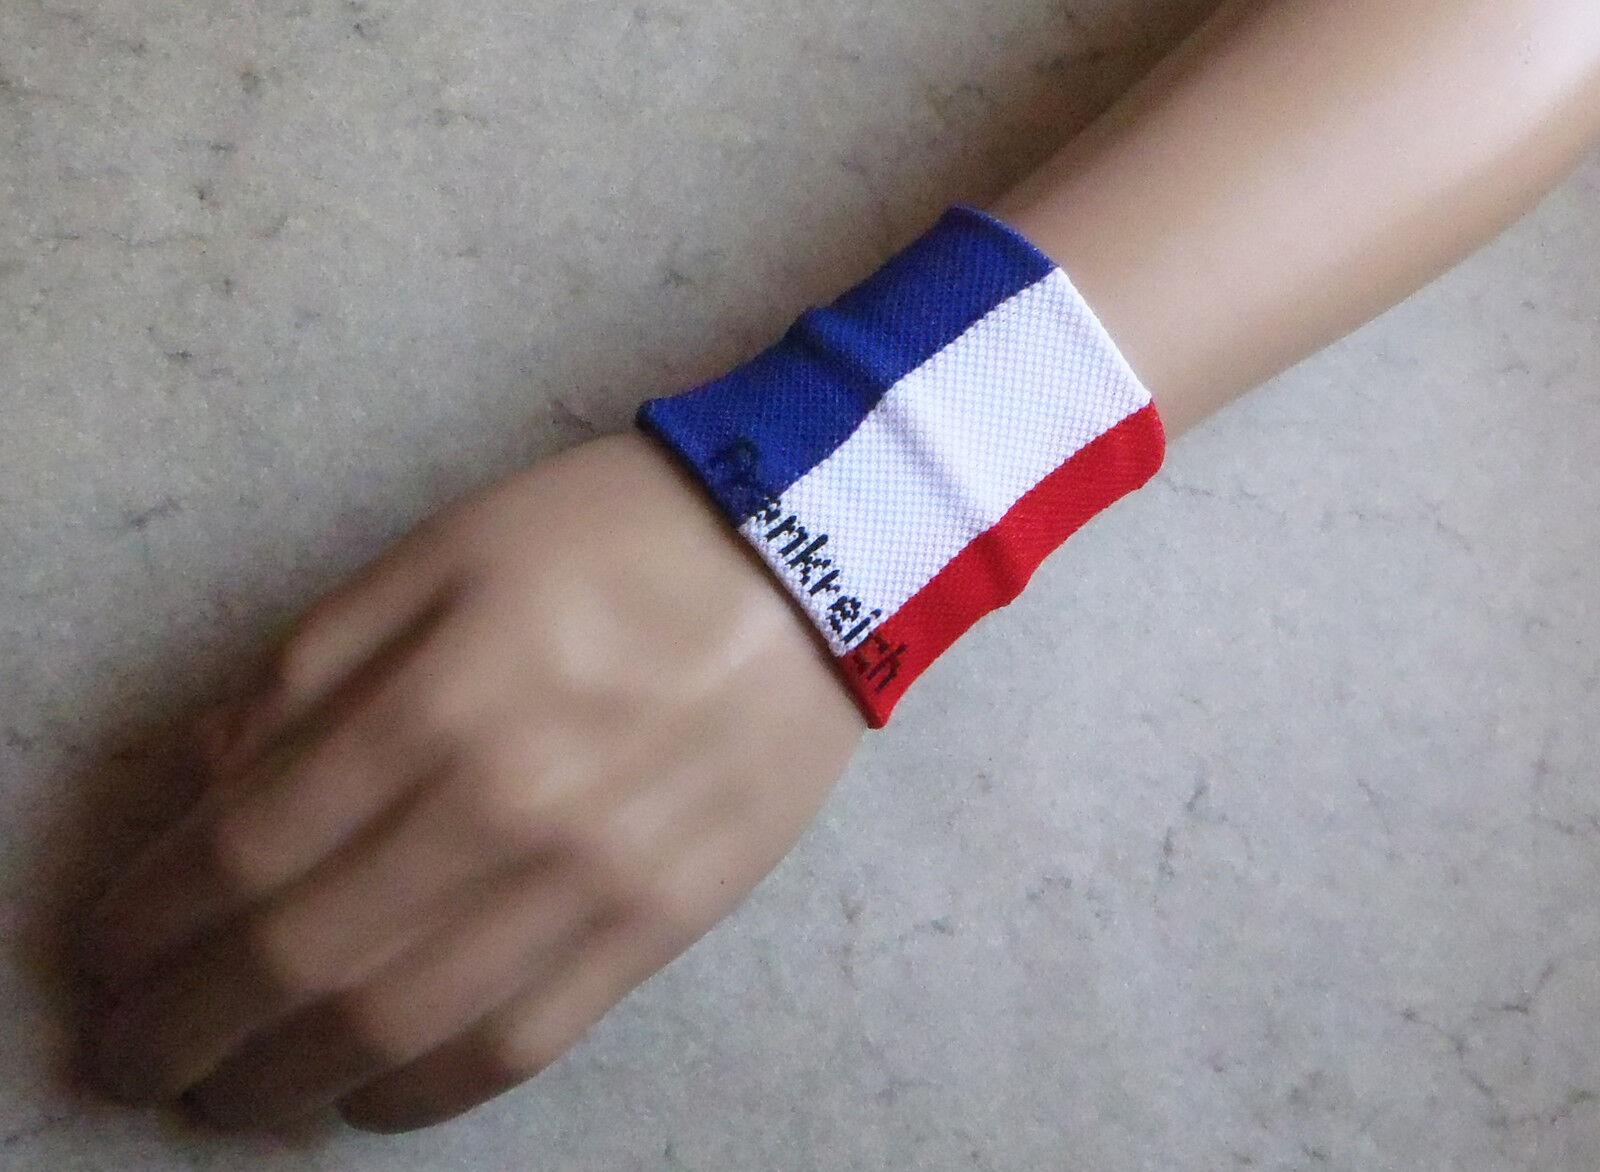 Bande poignet elastique éponge / wristband band sweat band wristband / sport & mode - France ae2eee